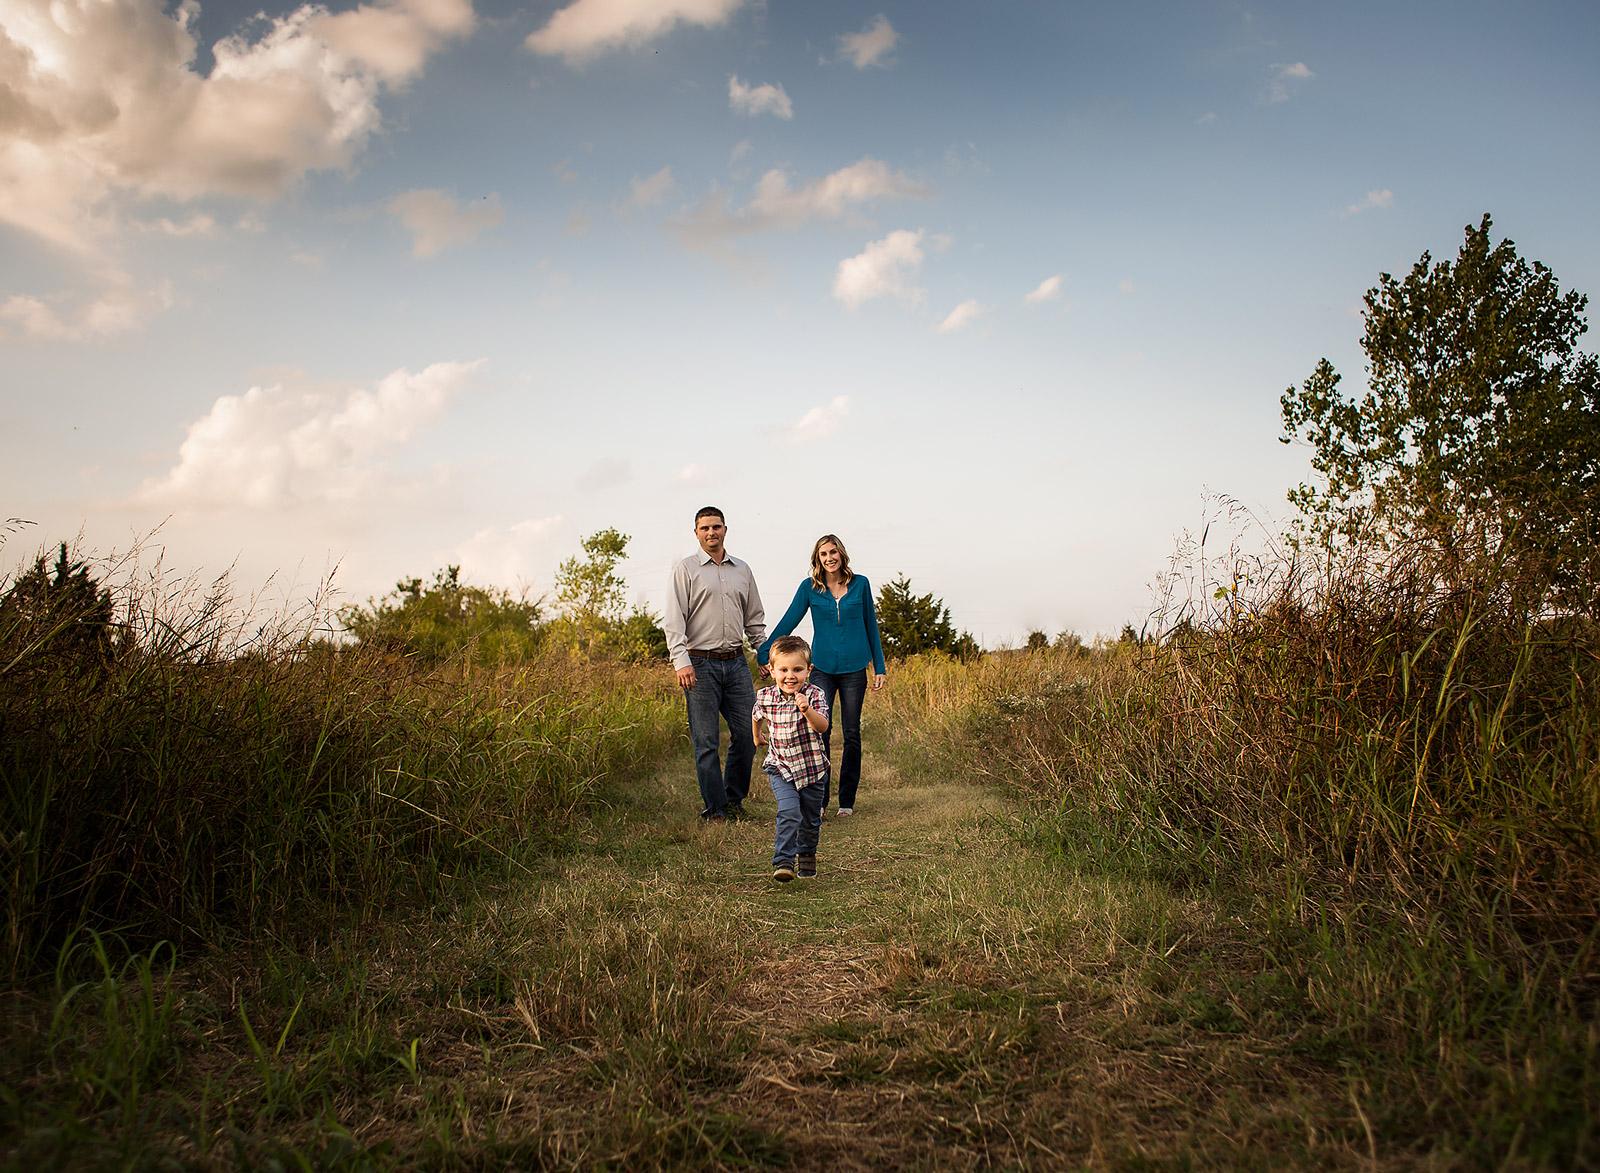 07 fall family photos mitch park edmond oklahoma family photographer kate luber photography okc ok (67).jpg